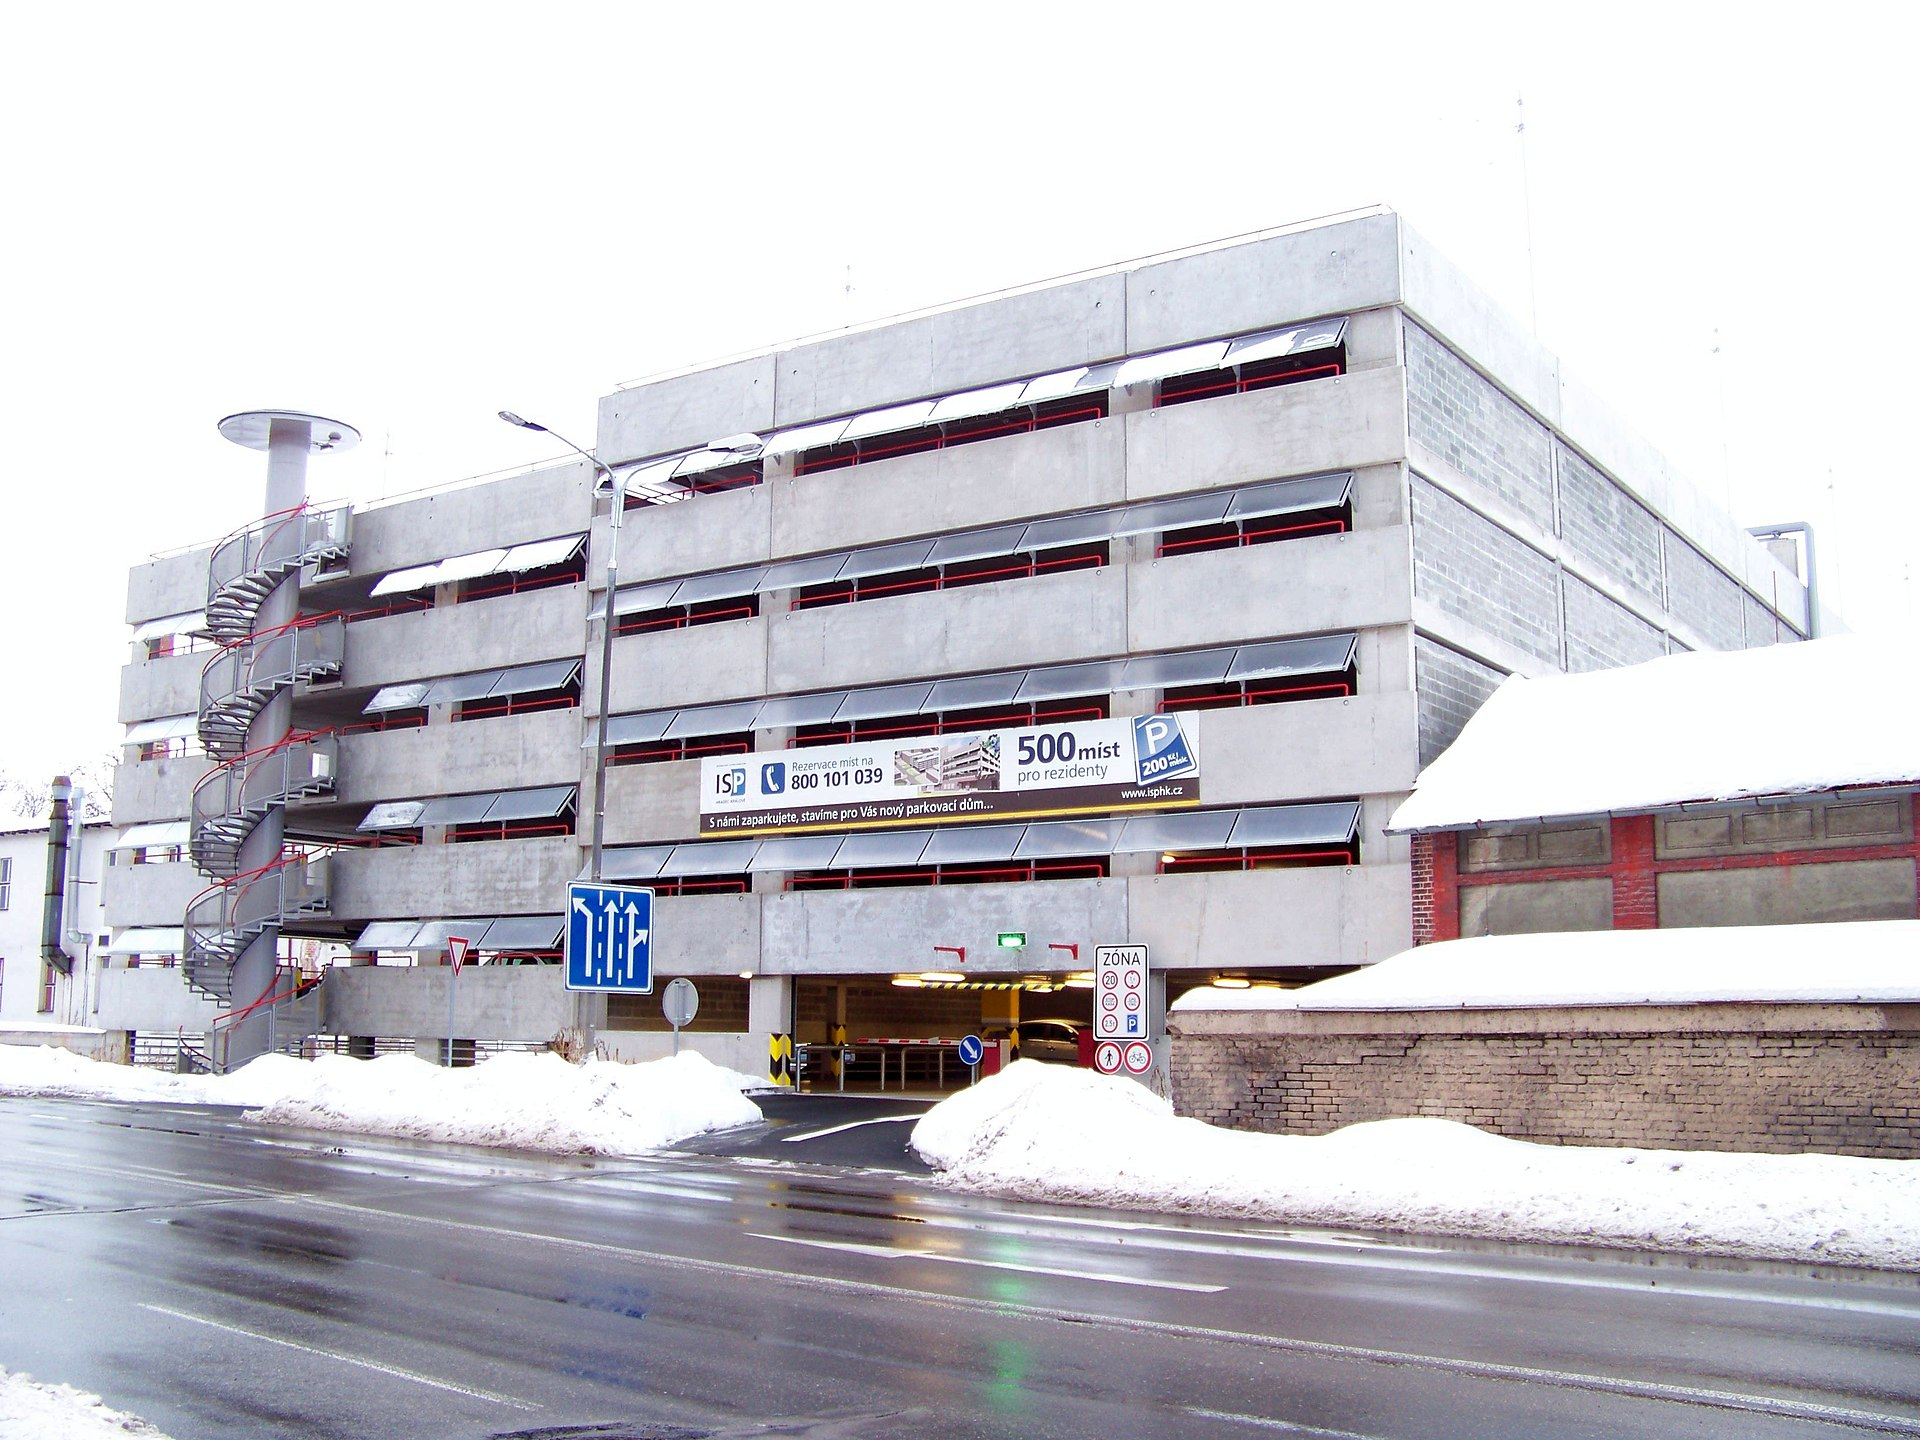 Multi storey car park wikipedia for Nomenclature icpe garage automobile